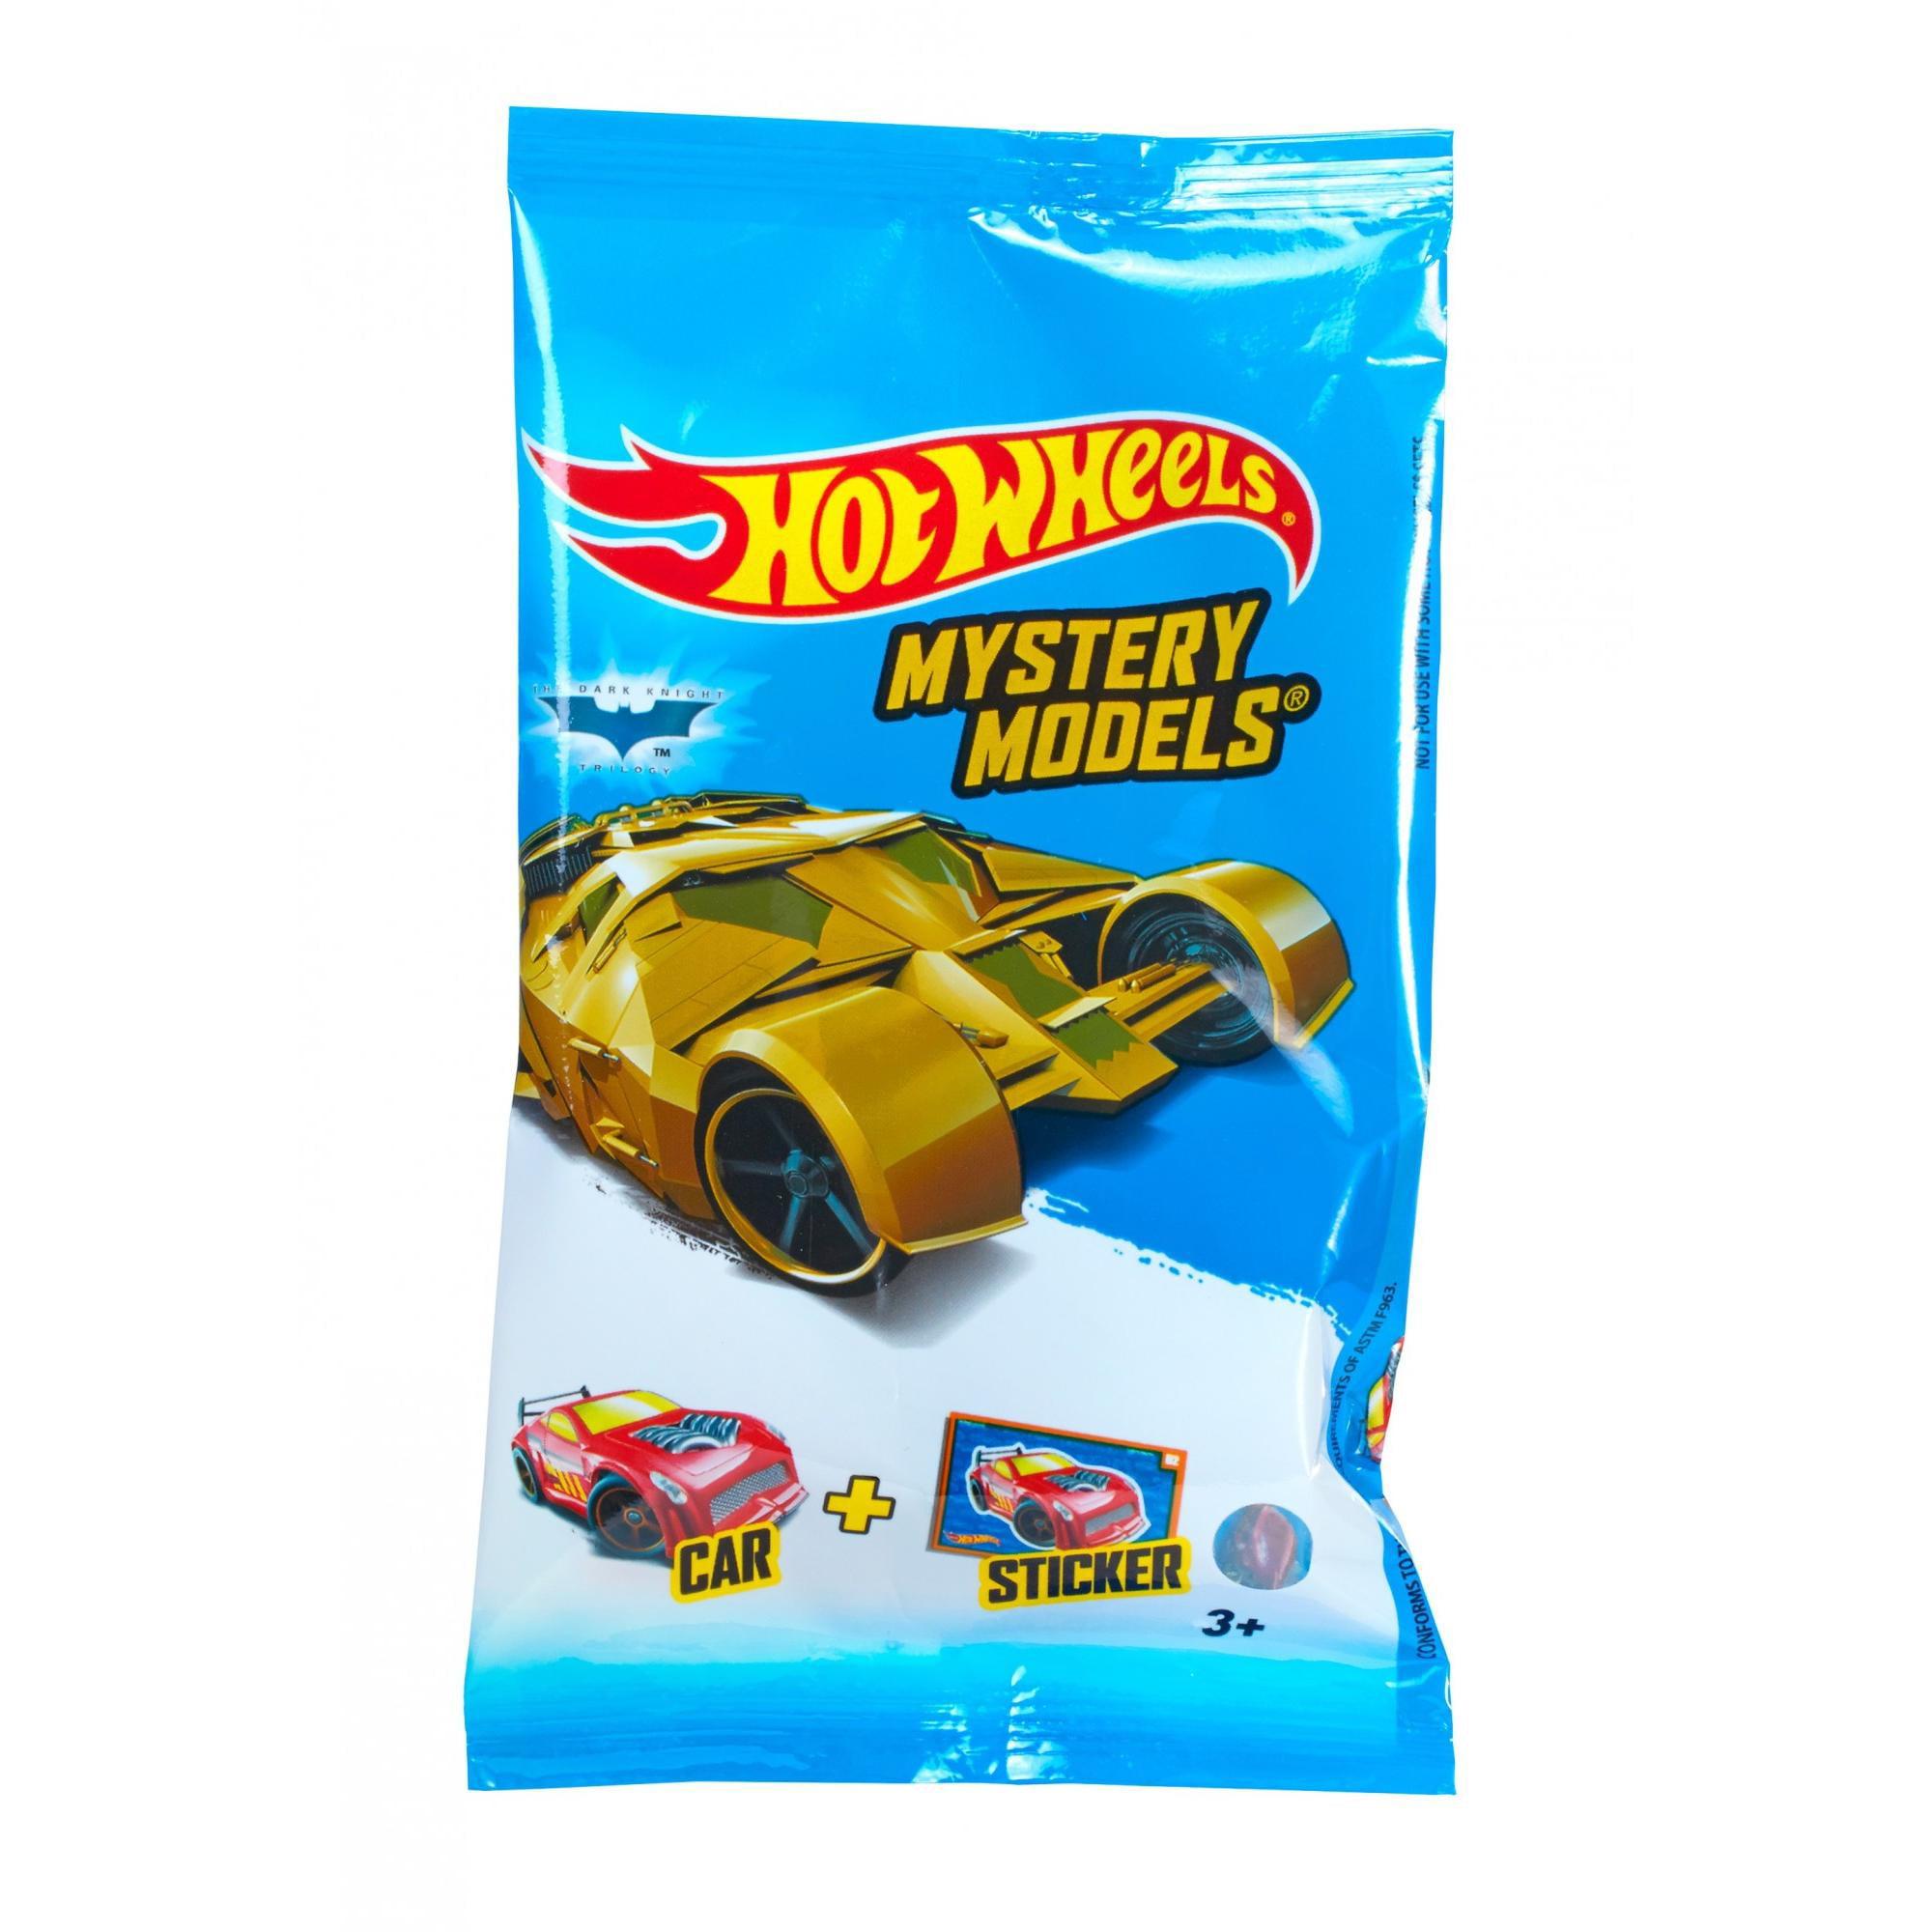 Hot Wheels Mystery Models Die-cast Vehicle (Styles May Vary)